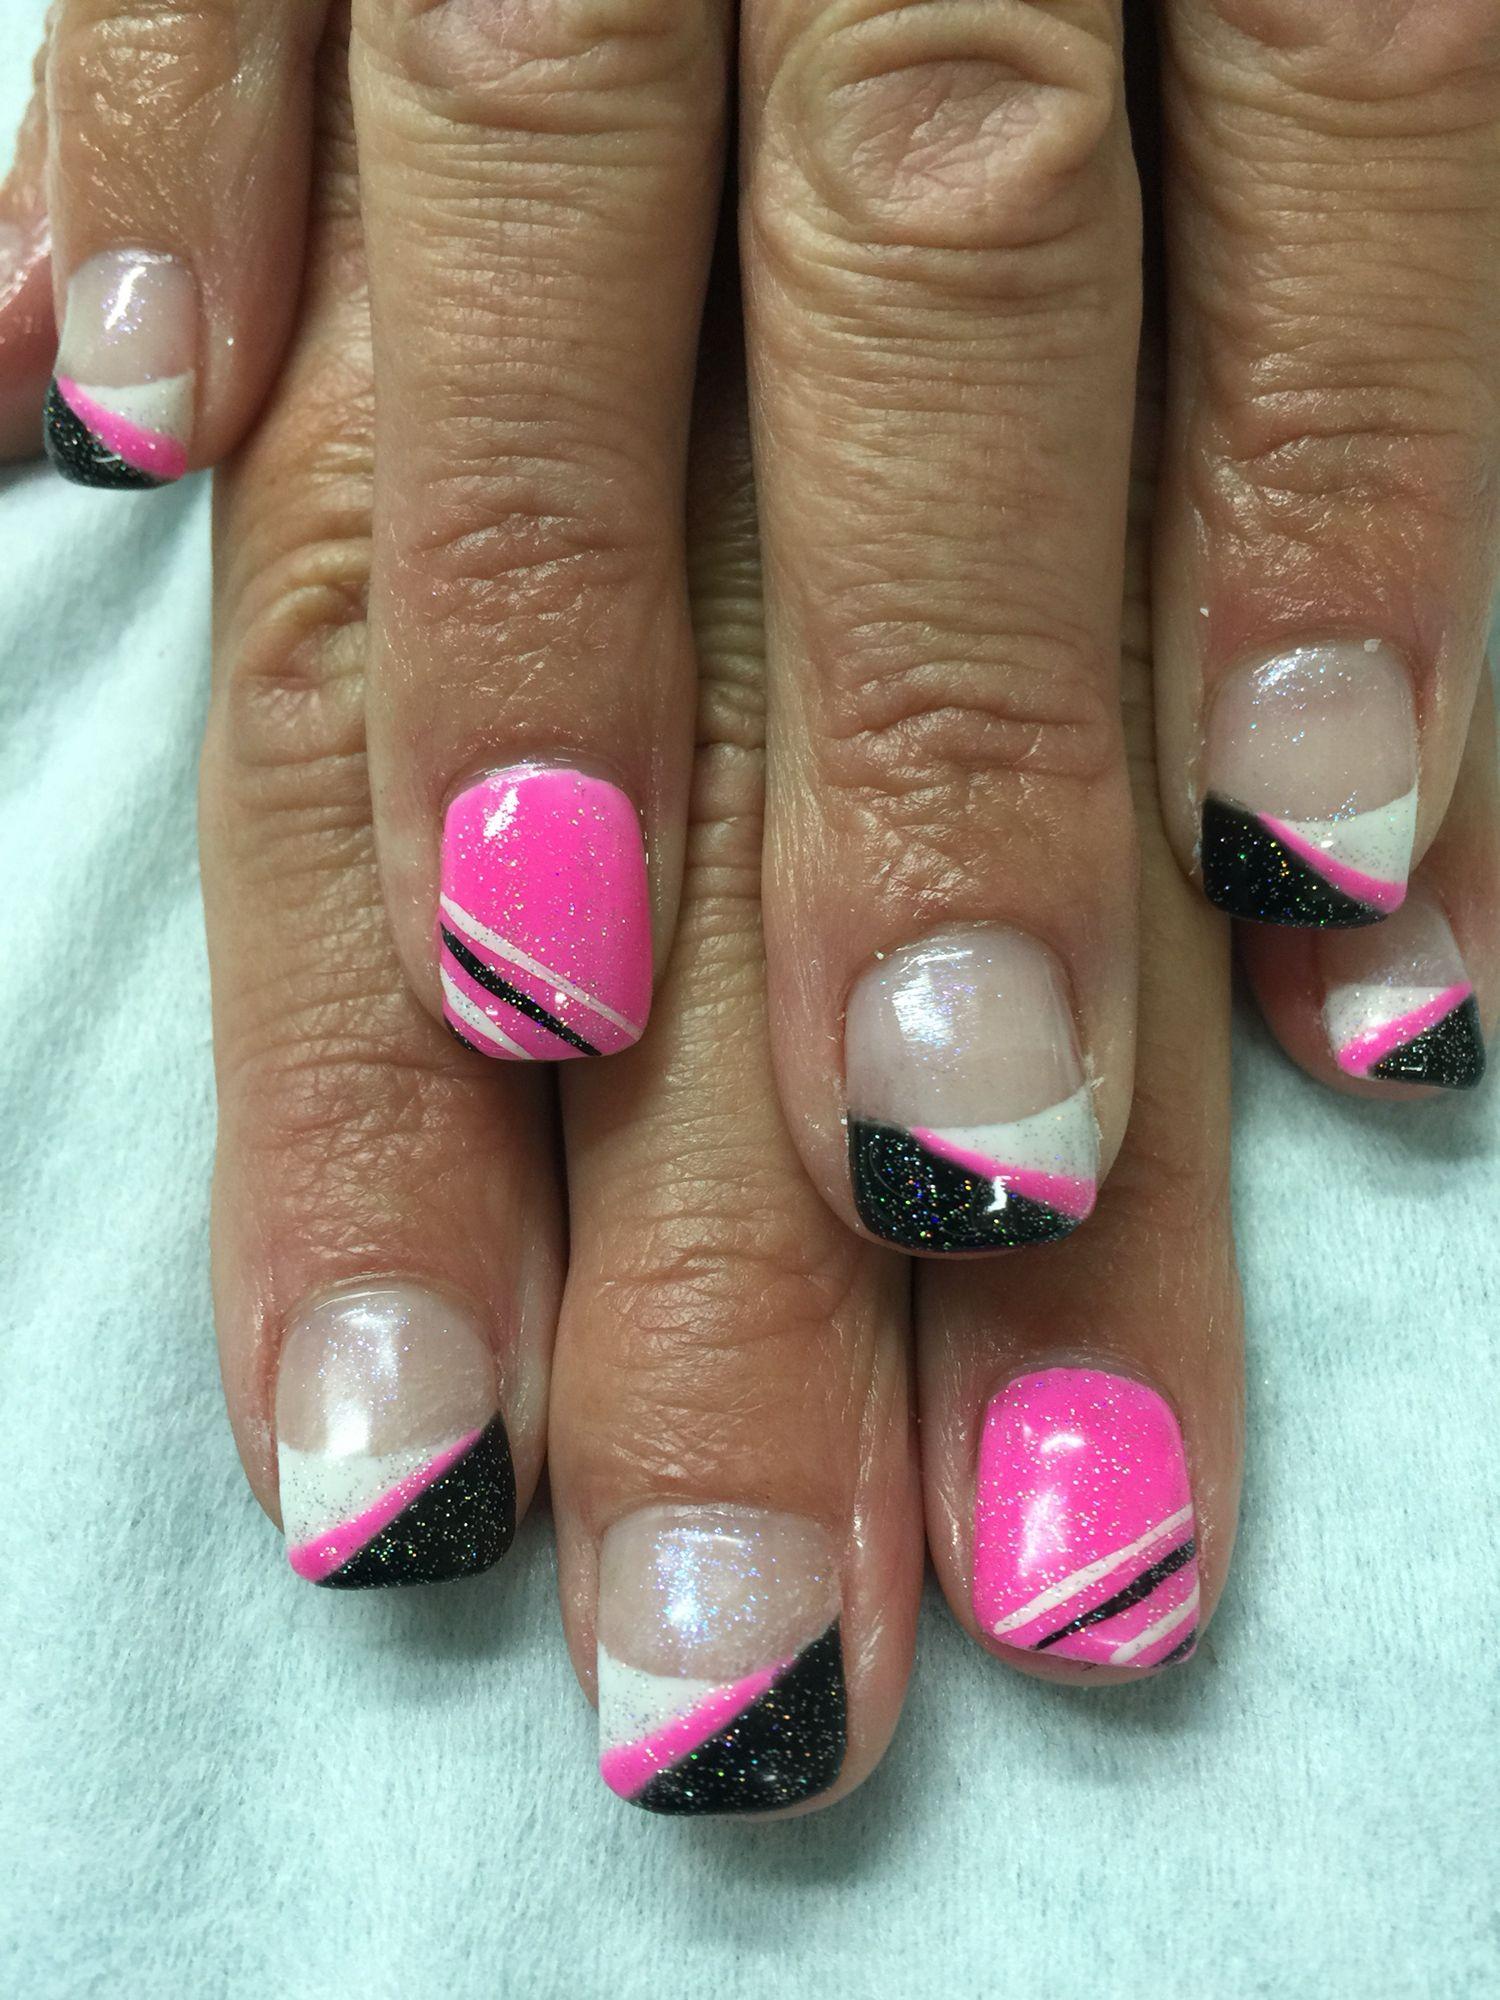 Fun Funky French Gel Polish Nails White Black Bright Pink